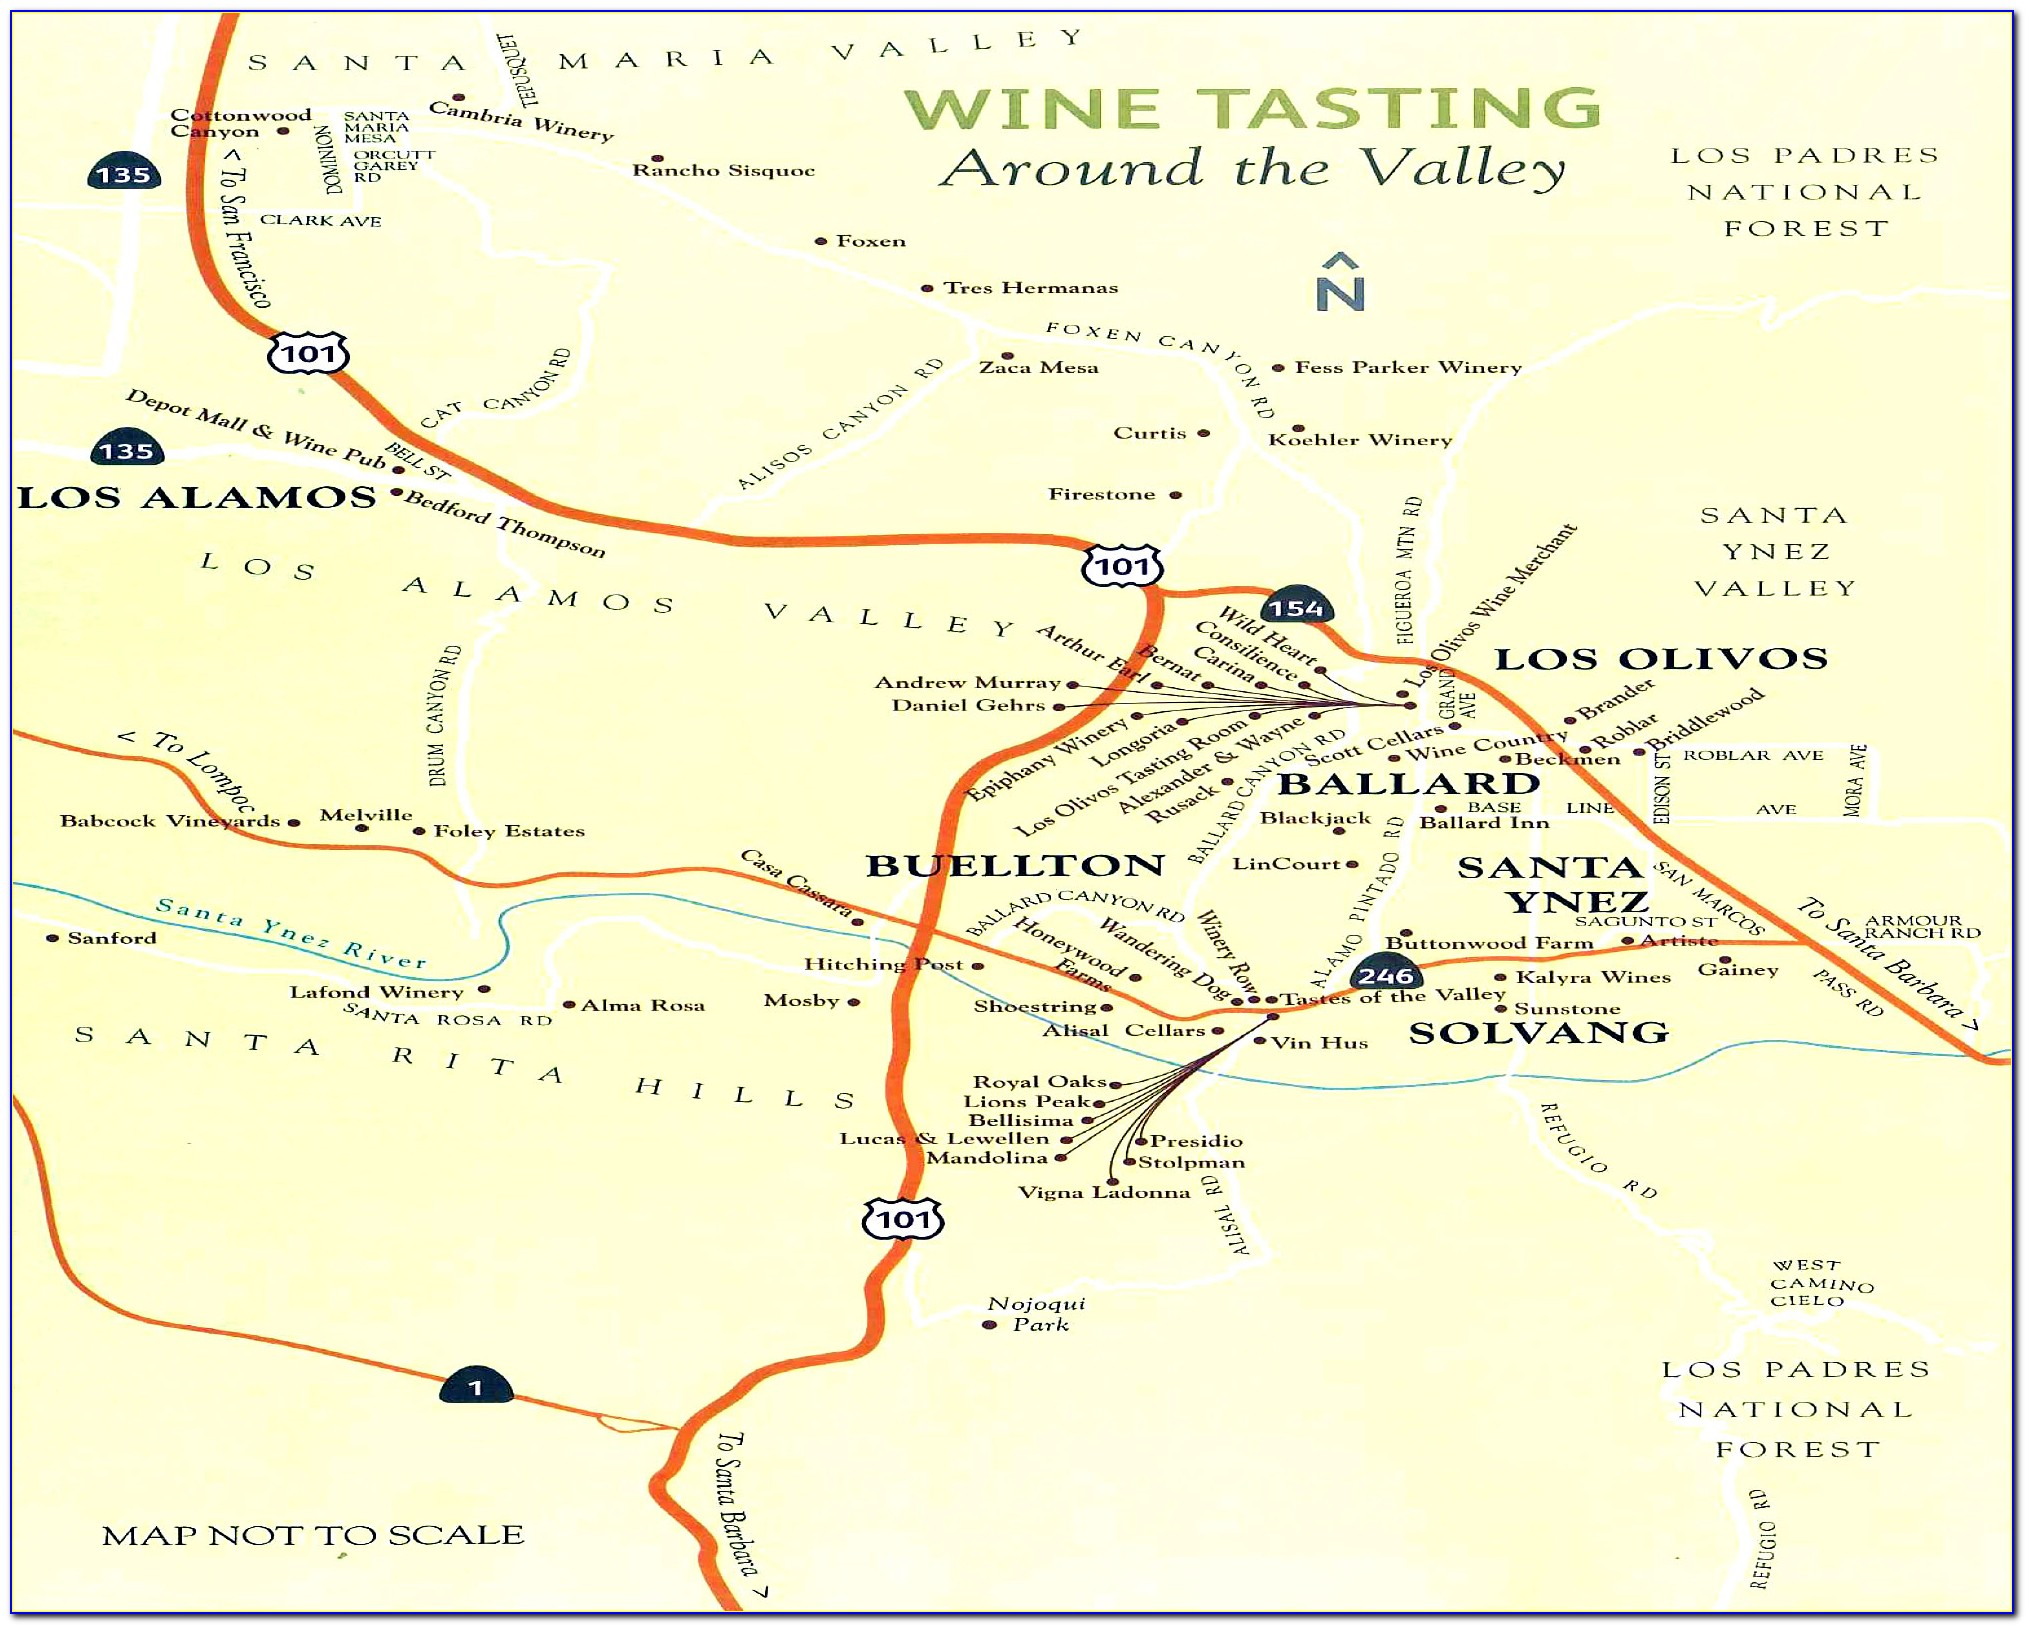 Santa Ynez Wine Tasting Map